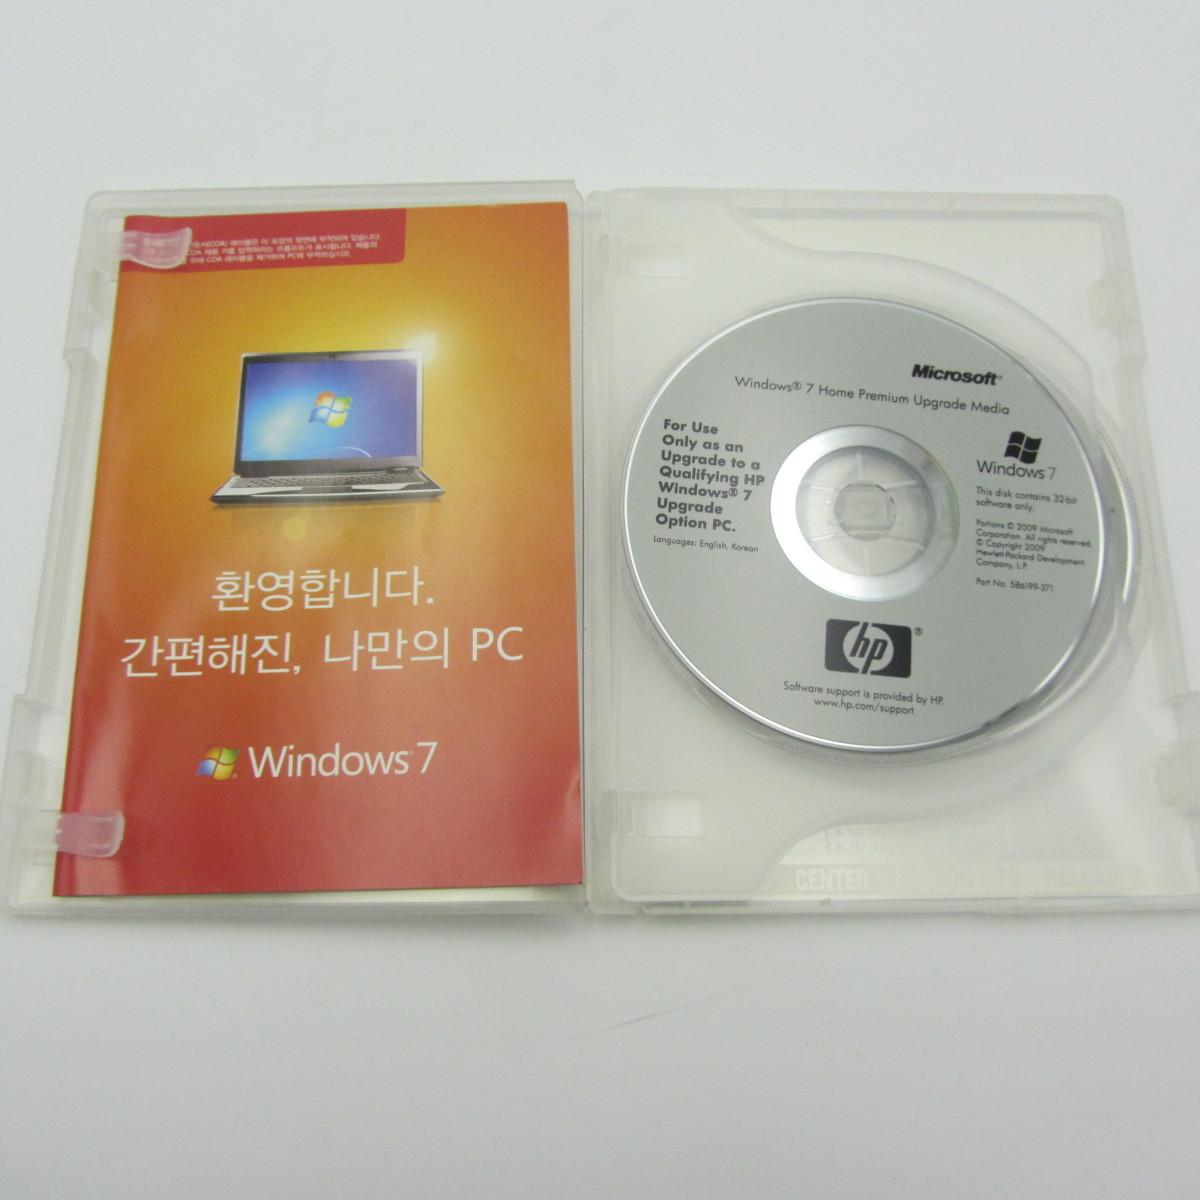 RS264●Windows 7 hp アップグレード用 vista から Windows 7 homepremium/ライセンスキー付き/英語 韓国語版_画像3